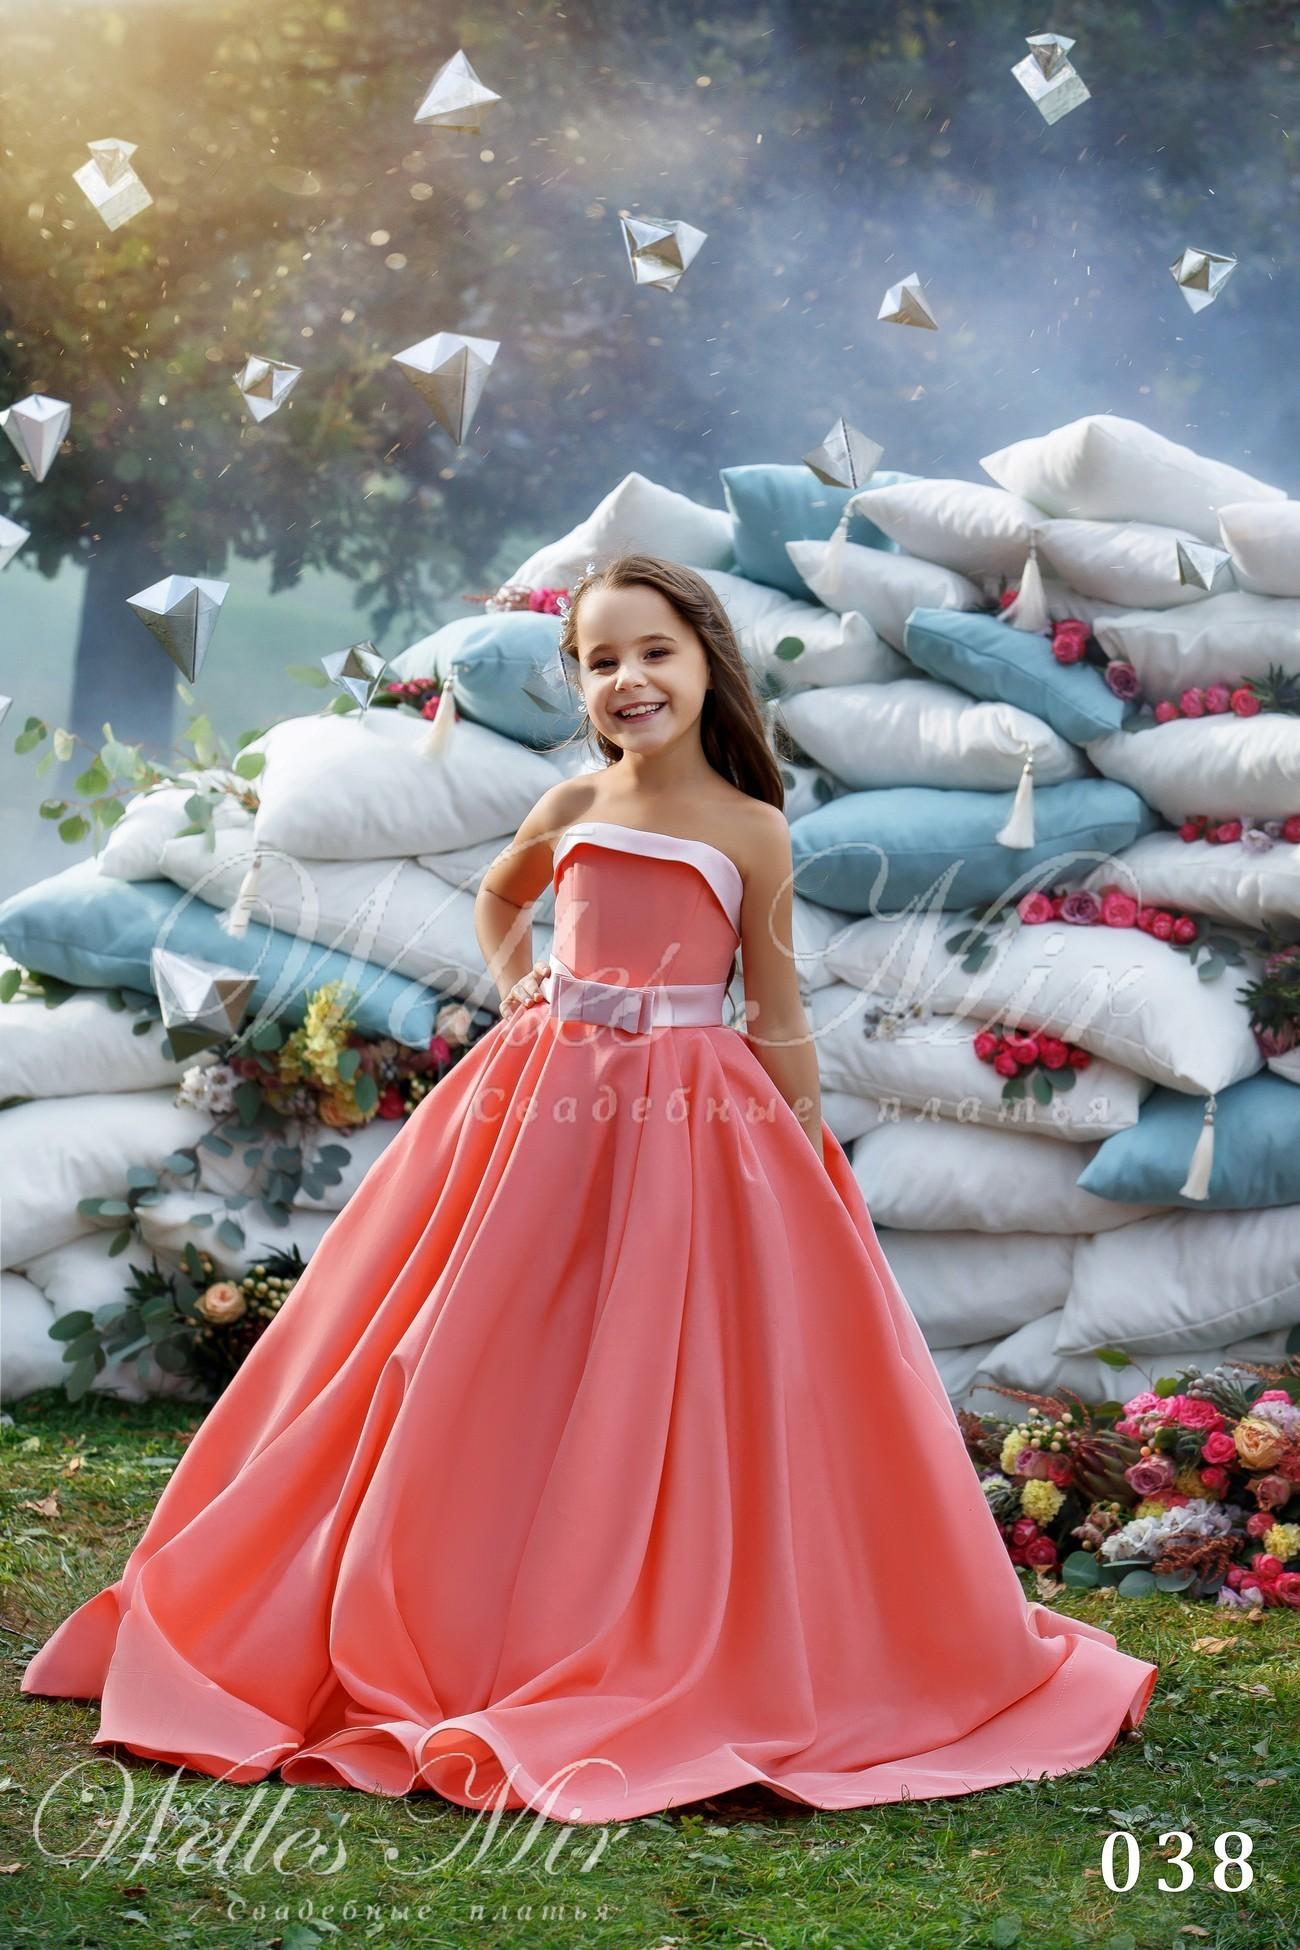 Детские платья Kids Deluxe Collection 2018 - 038